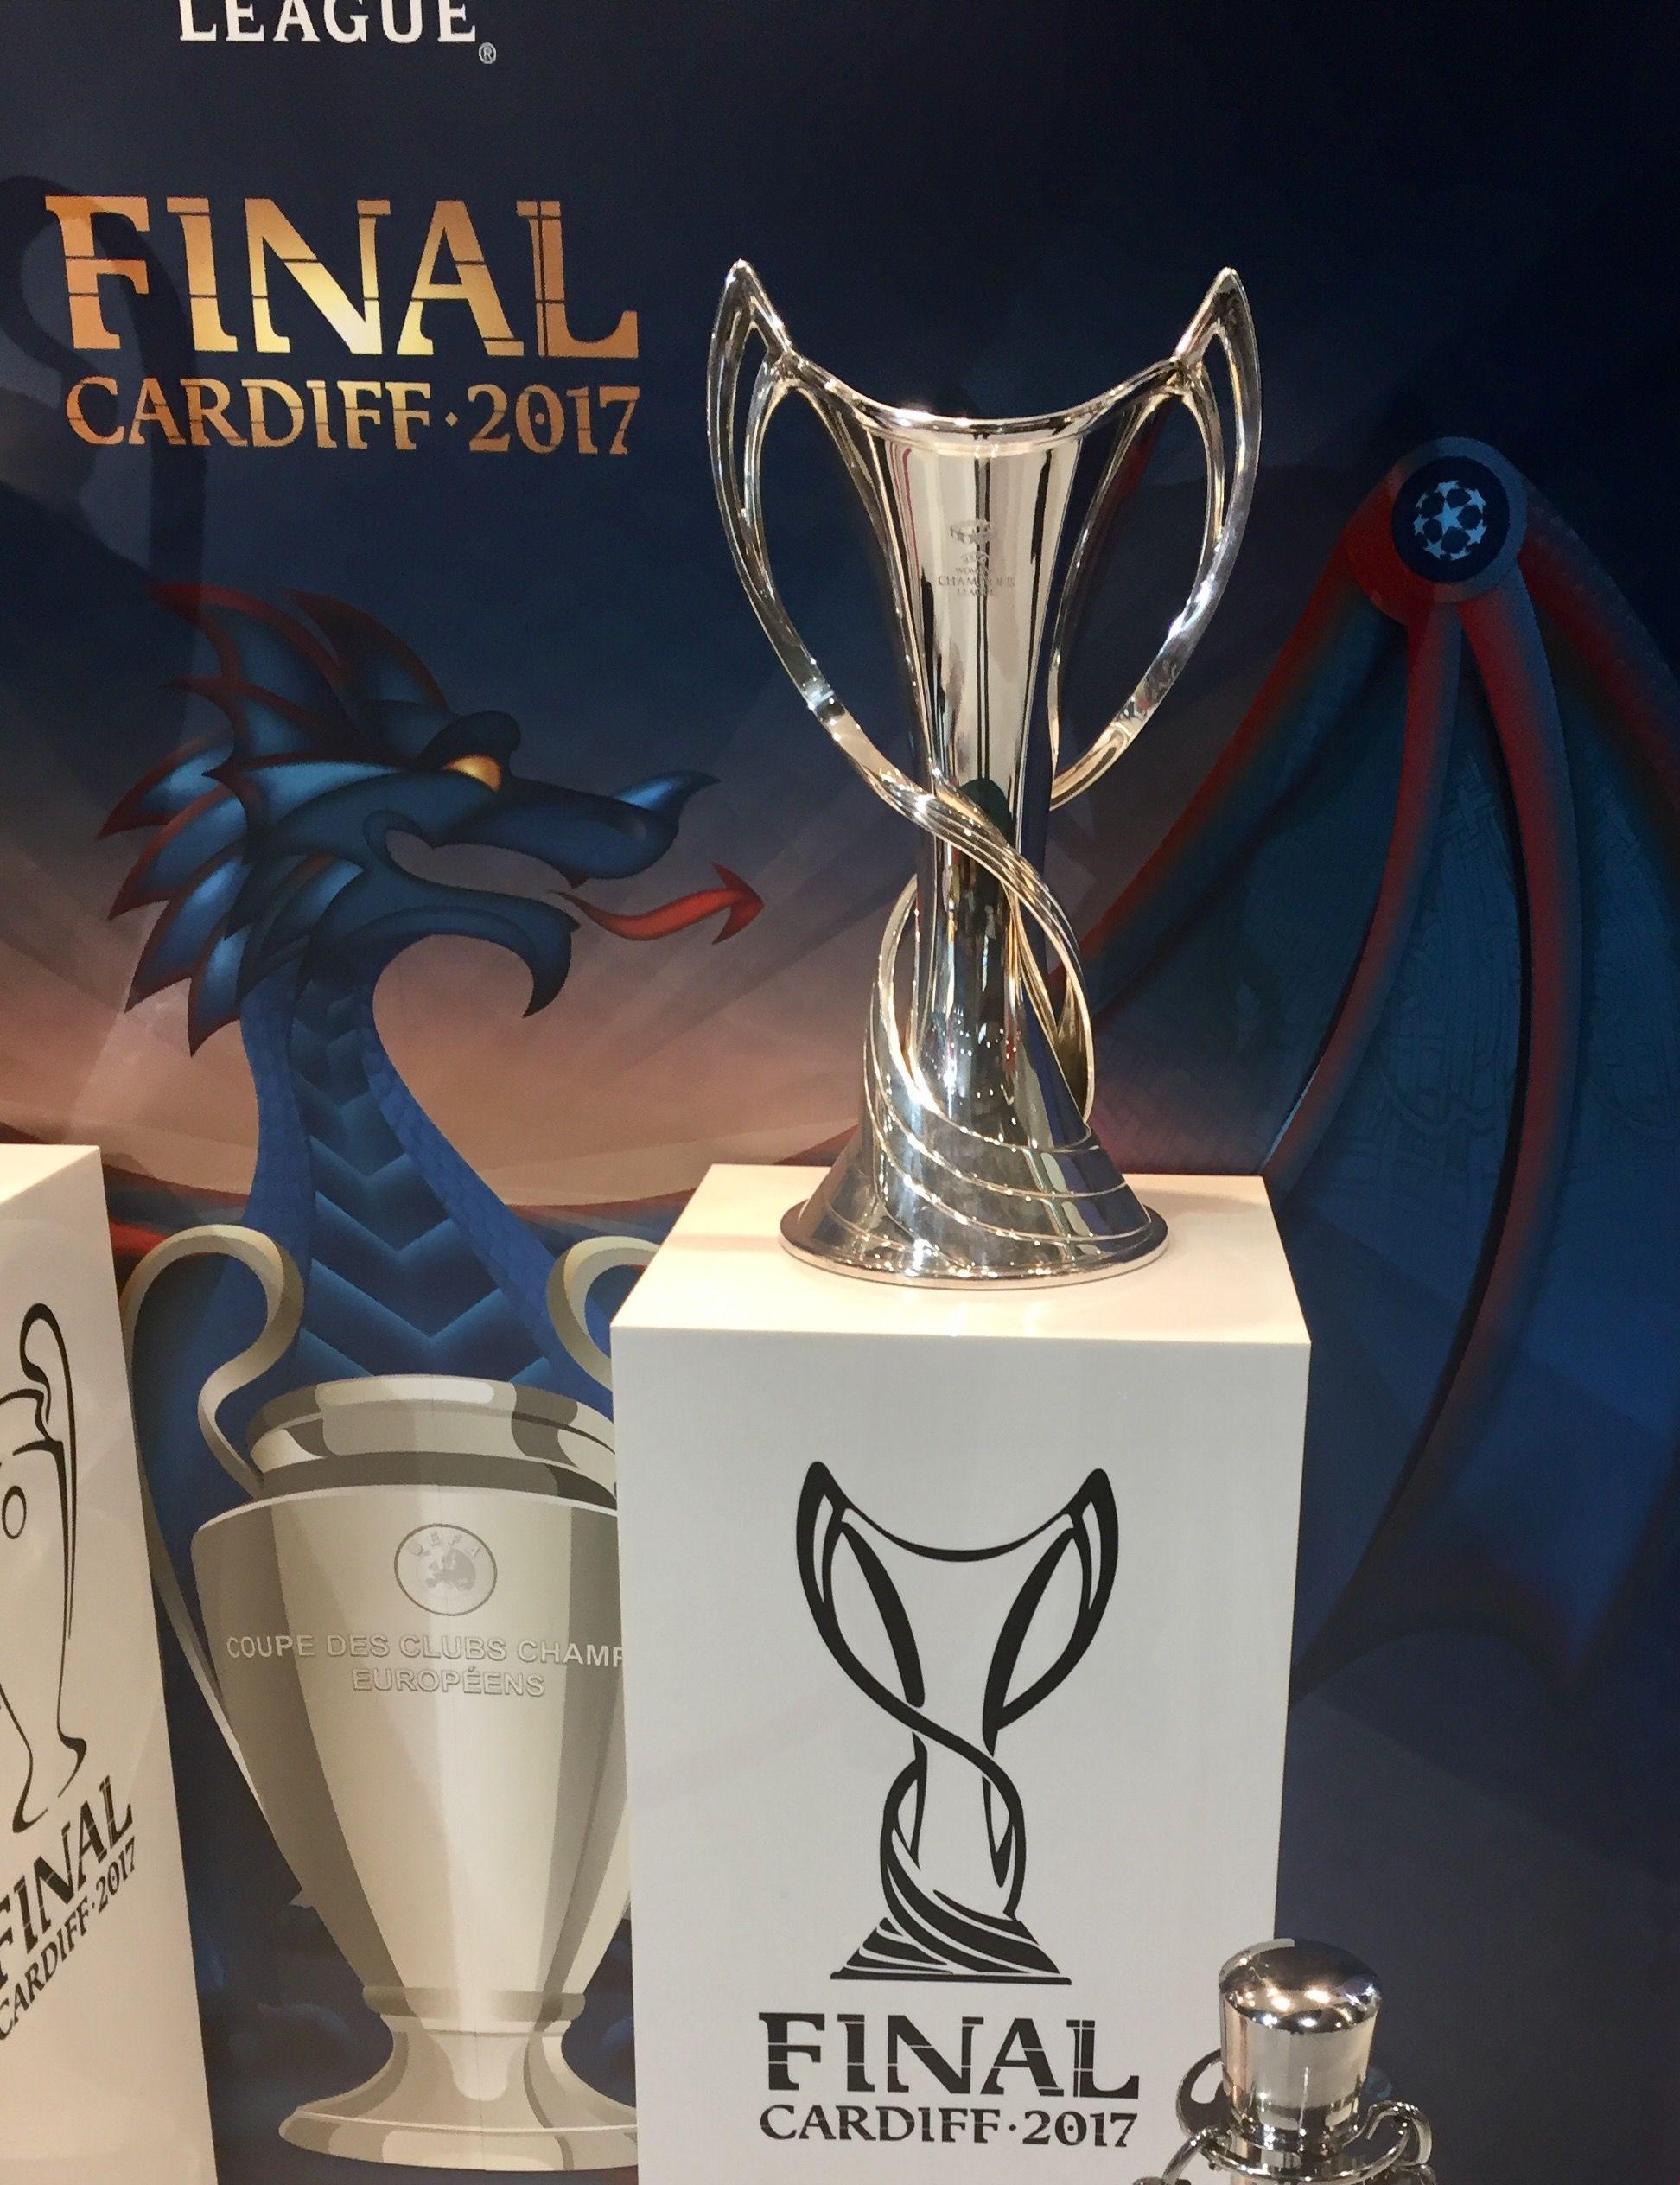 UEFA Ladies Trophy Champions league, European football